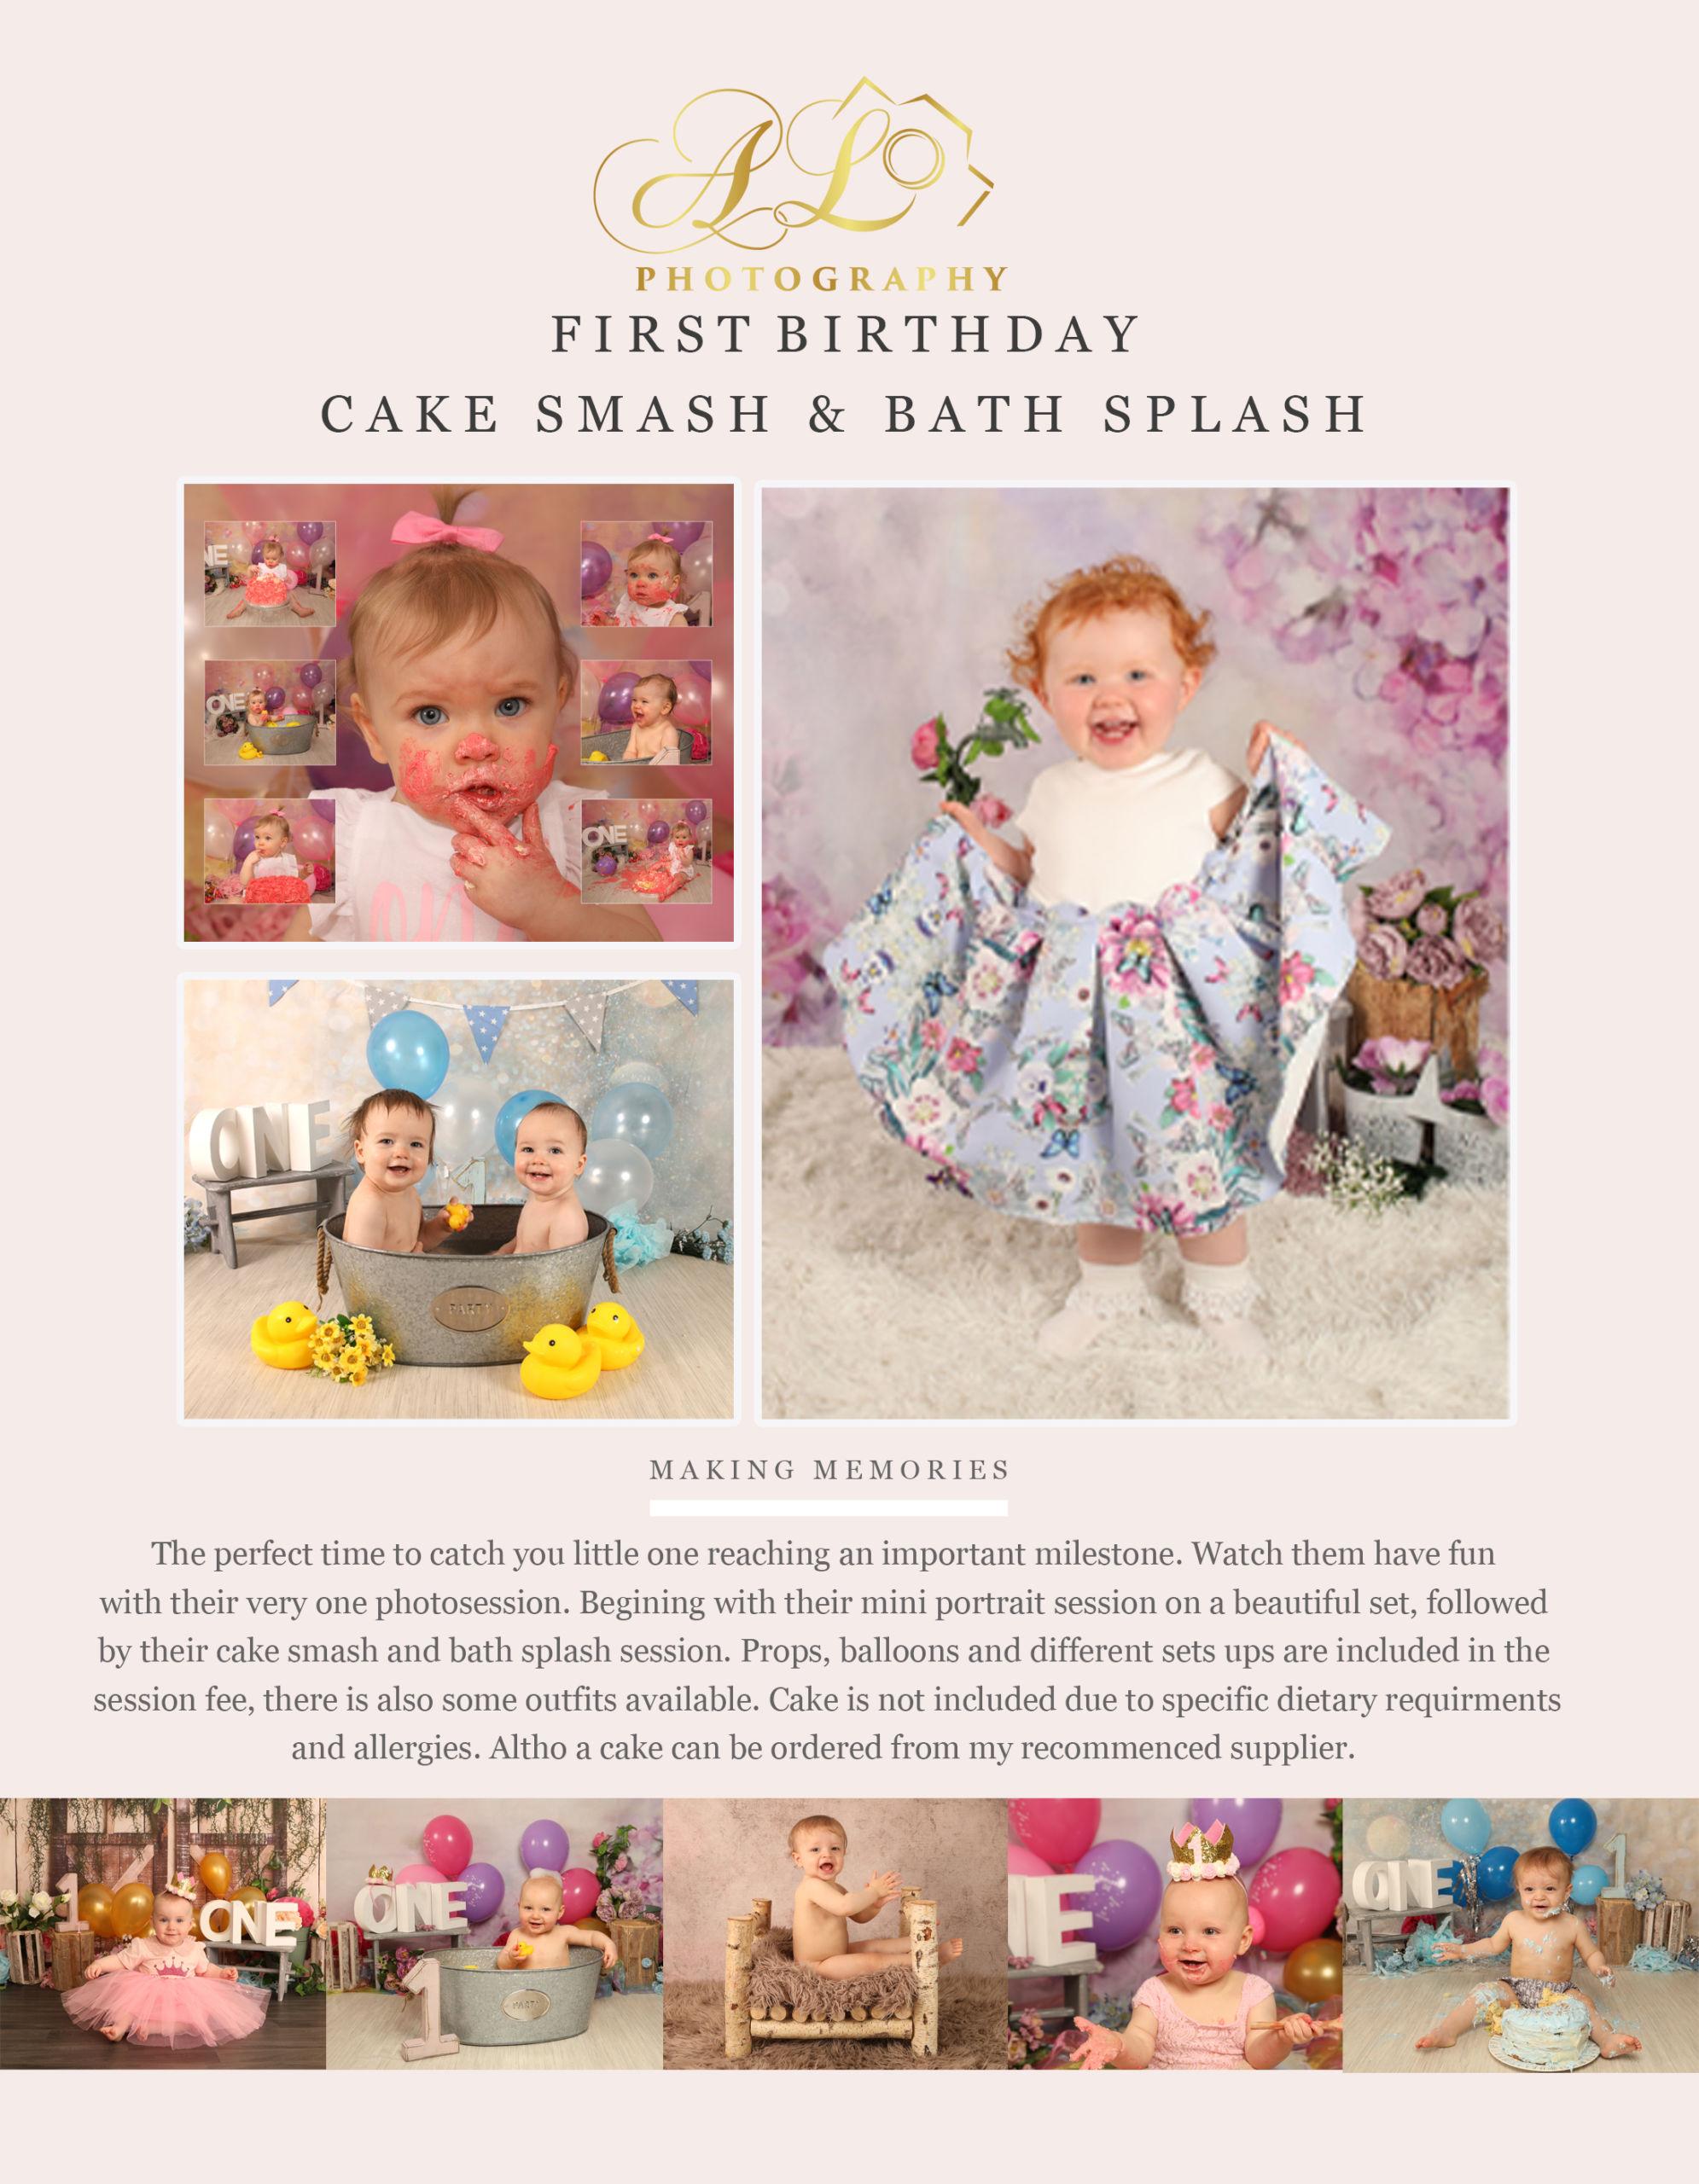 cake smash & bath splash photography pricing